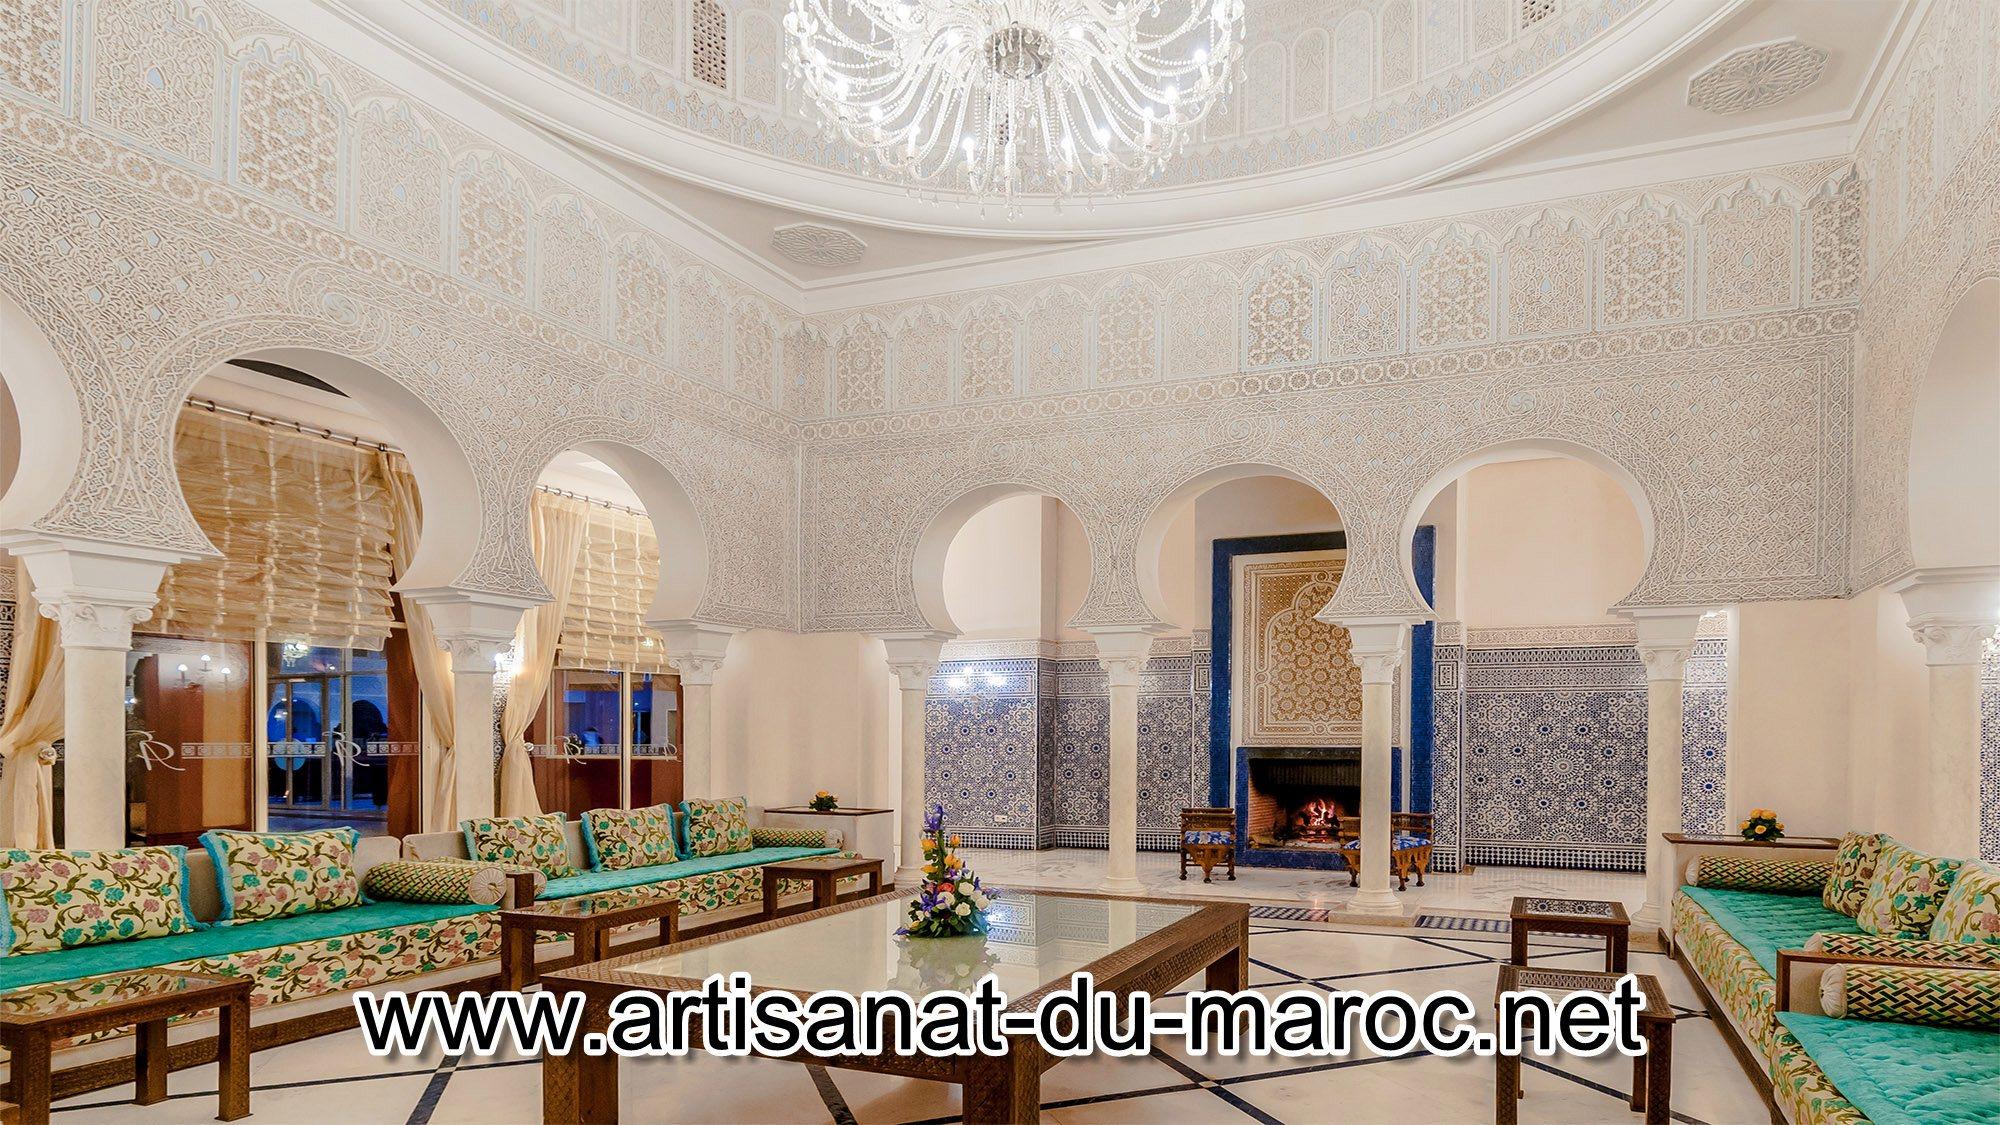 vente de salon marocain europe salon moderne france ou belgique d co salon marocain. Black Bedroom Furniture Sets. Home Design Ideas